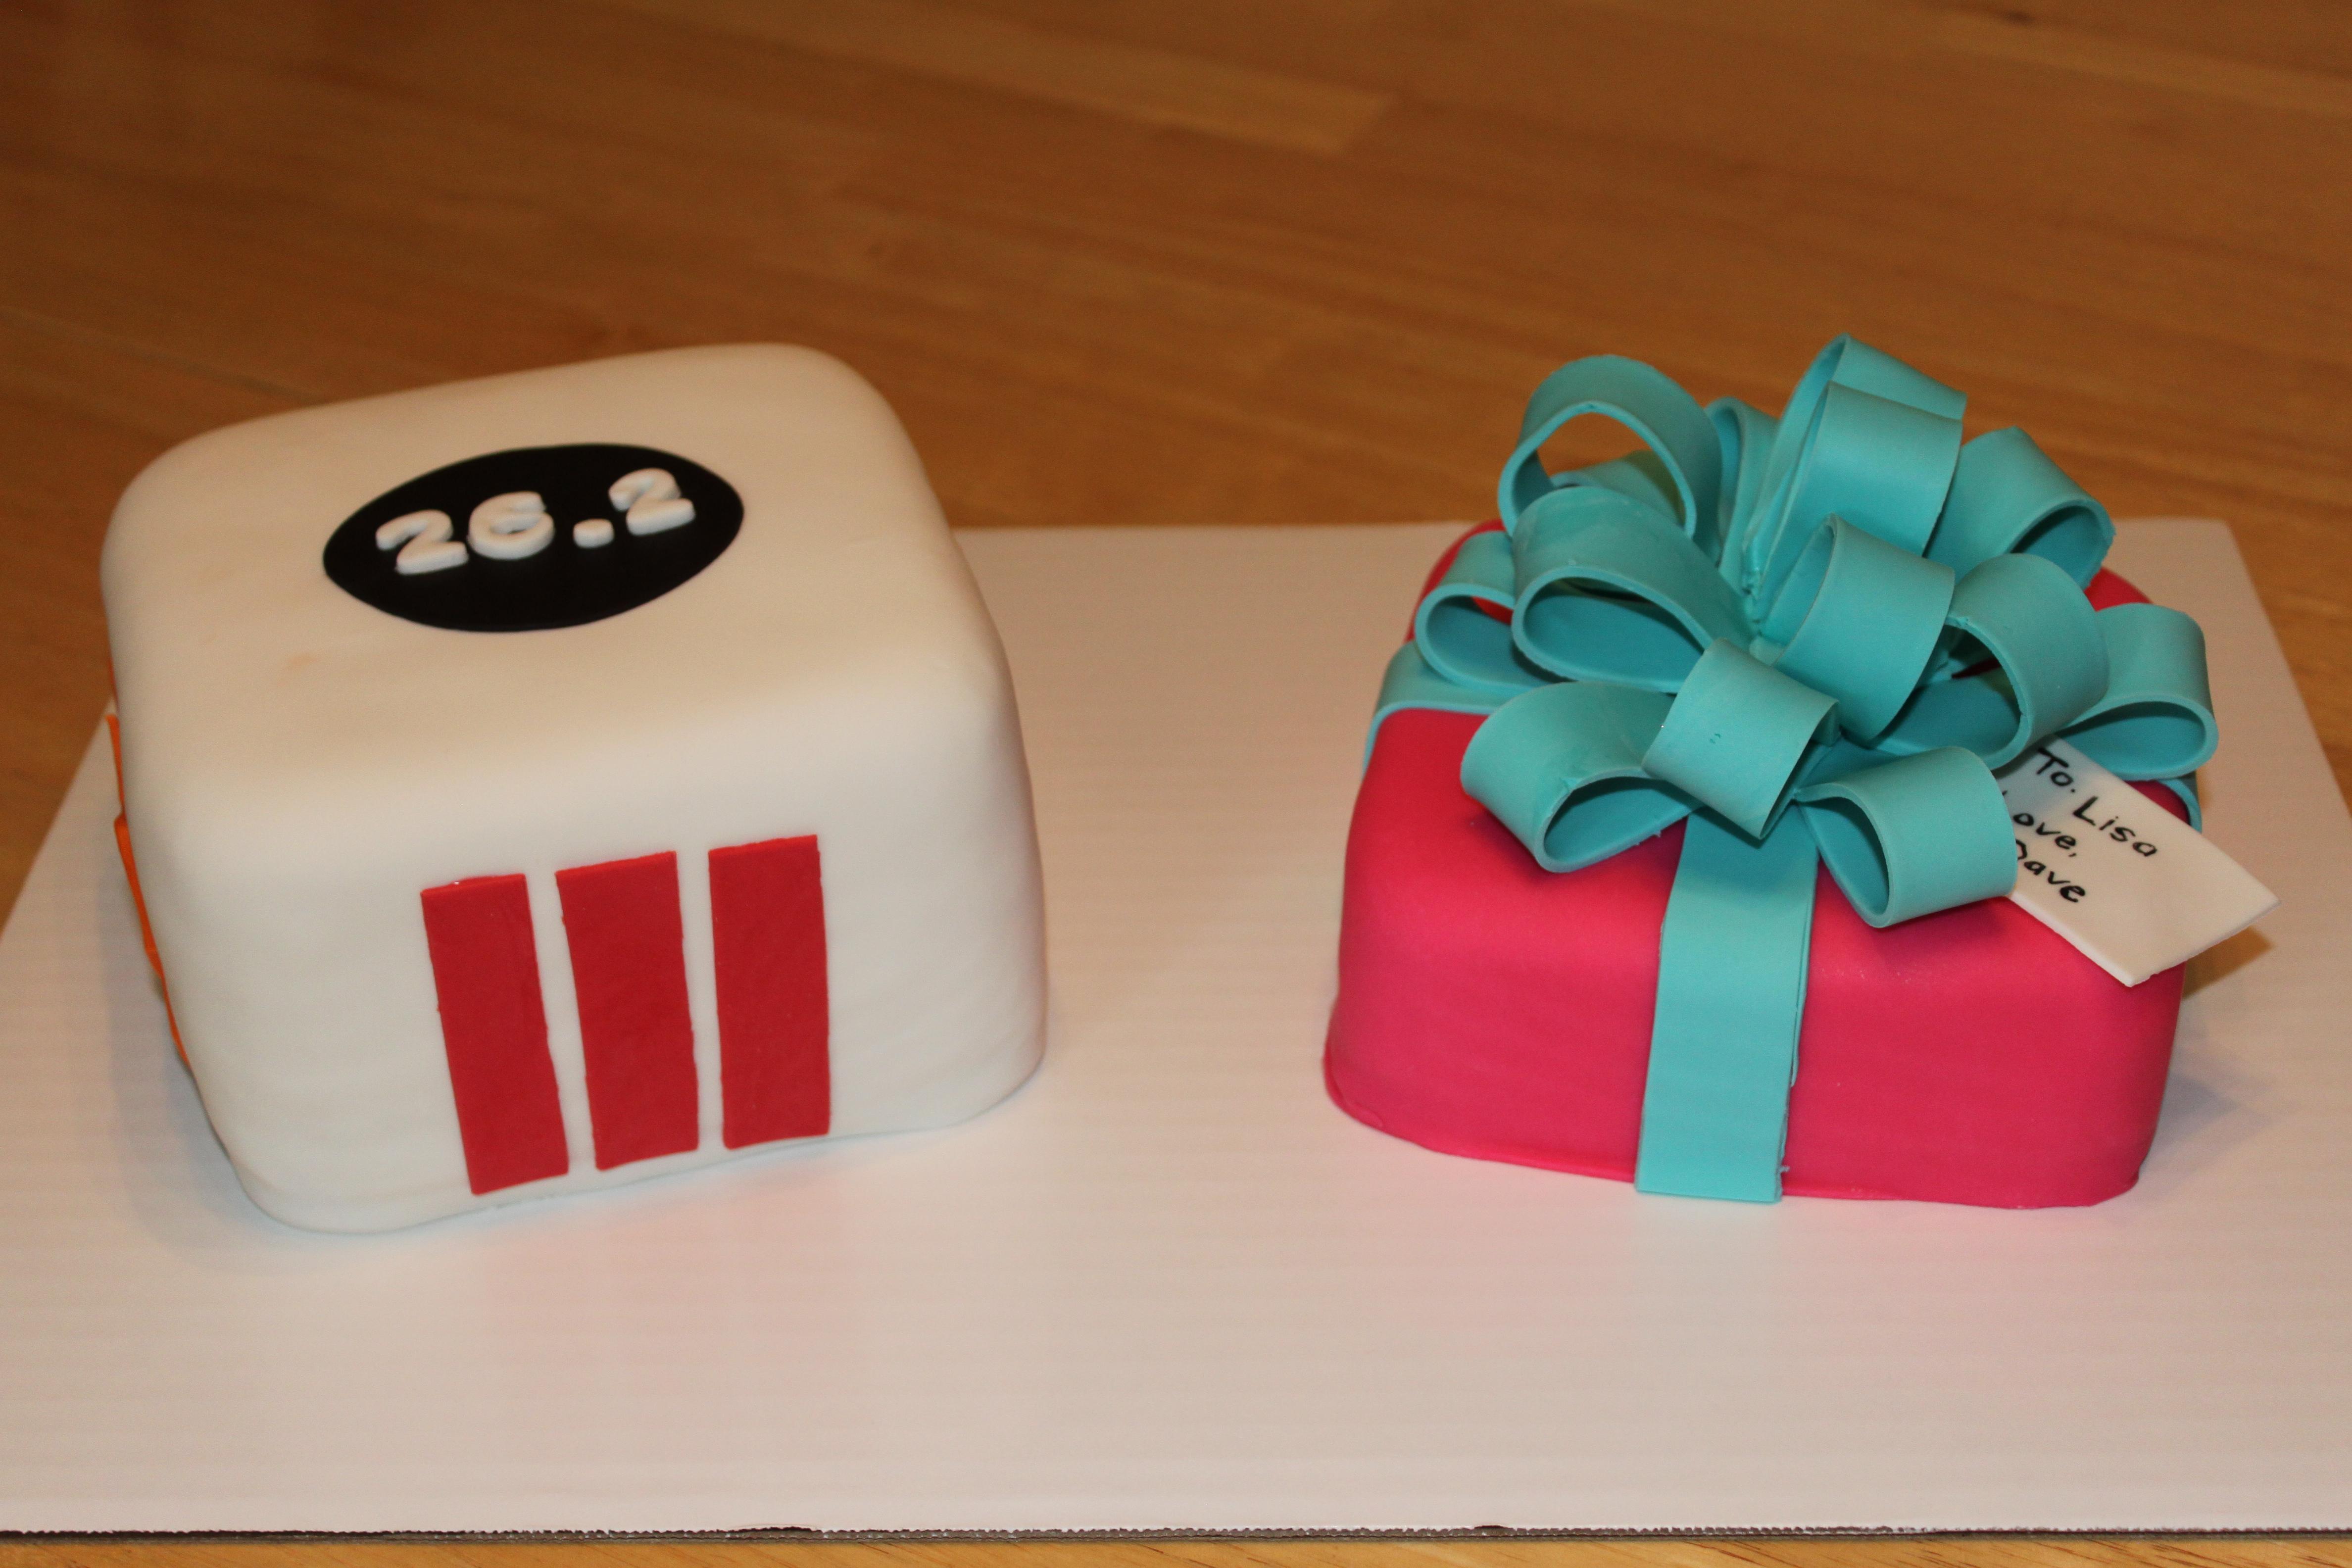 Strange Marathon Logos And Birthday Present Fondant Cakes Pennys Food Blog Funny Birthday Cards Online Drosicarndamsfinfo